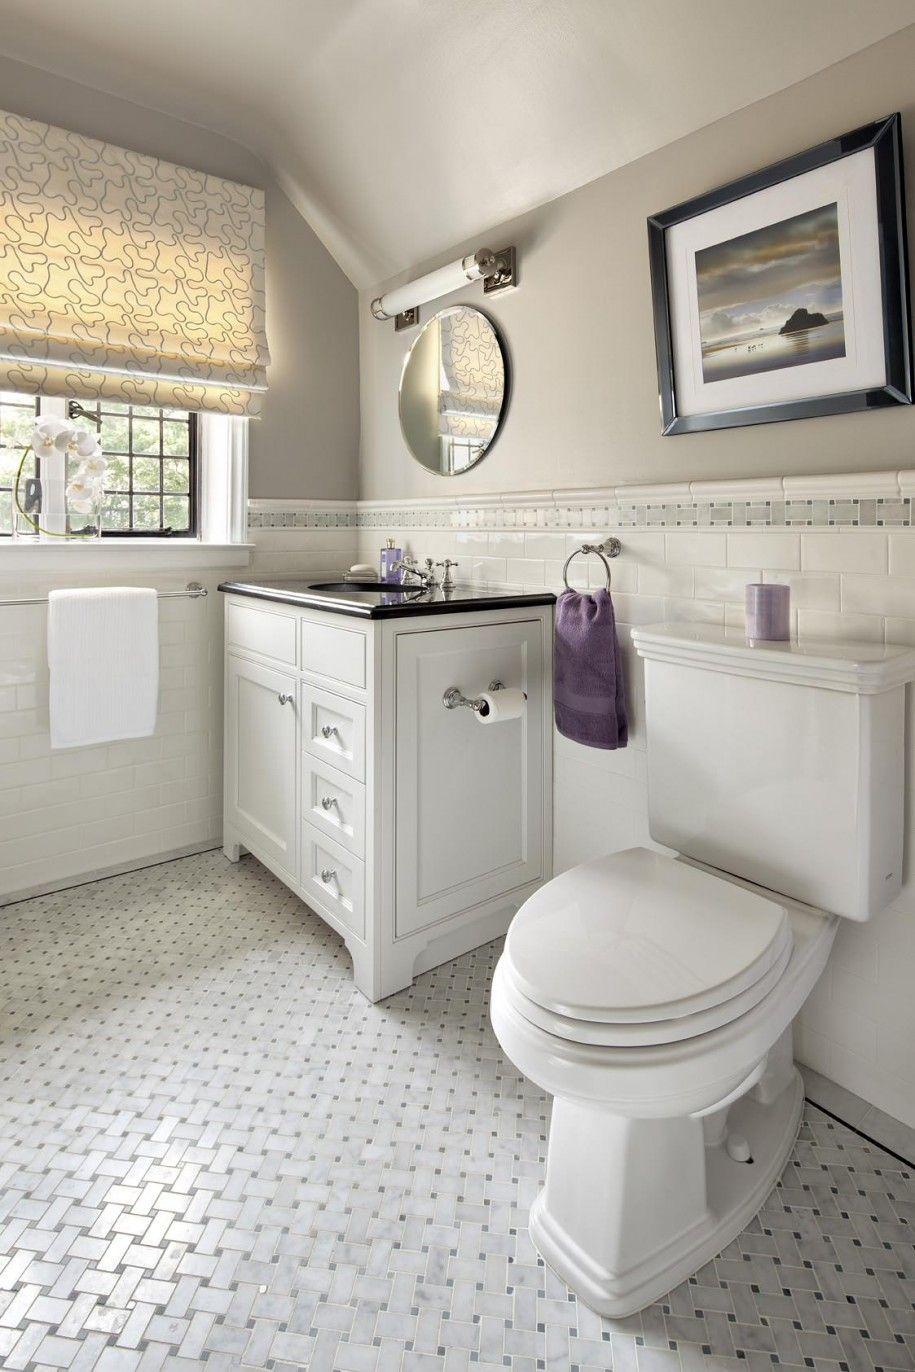 Stunning Basket Weave Tile For Classic Bathroom Design ...